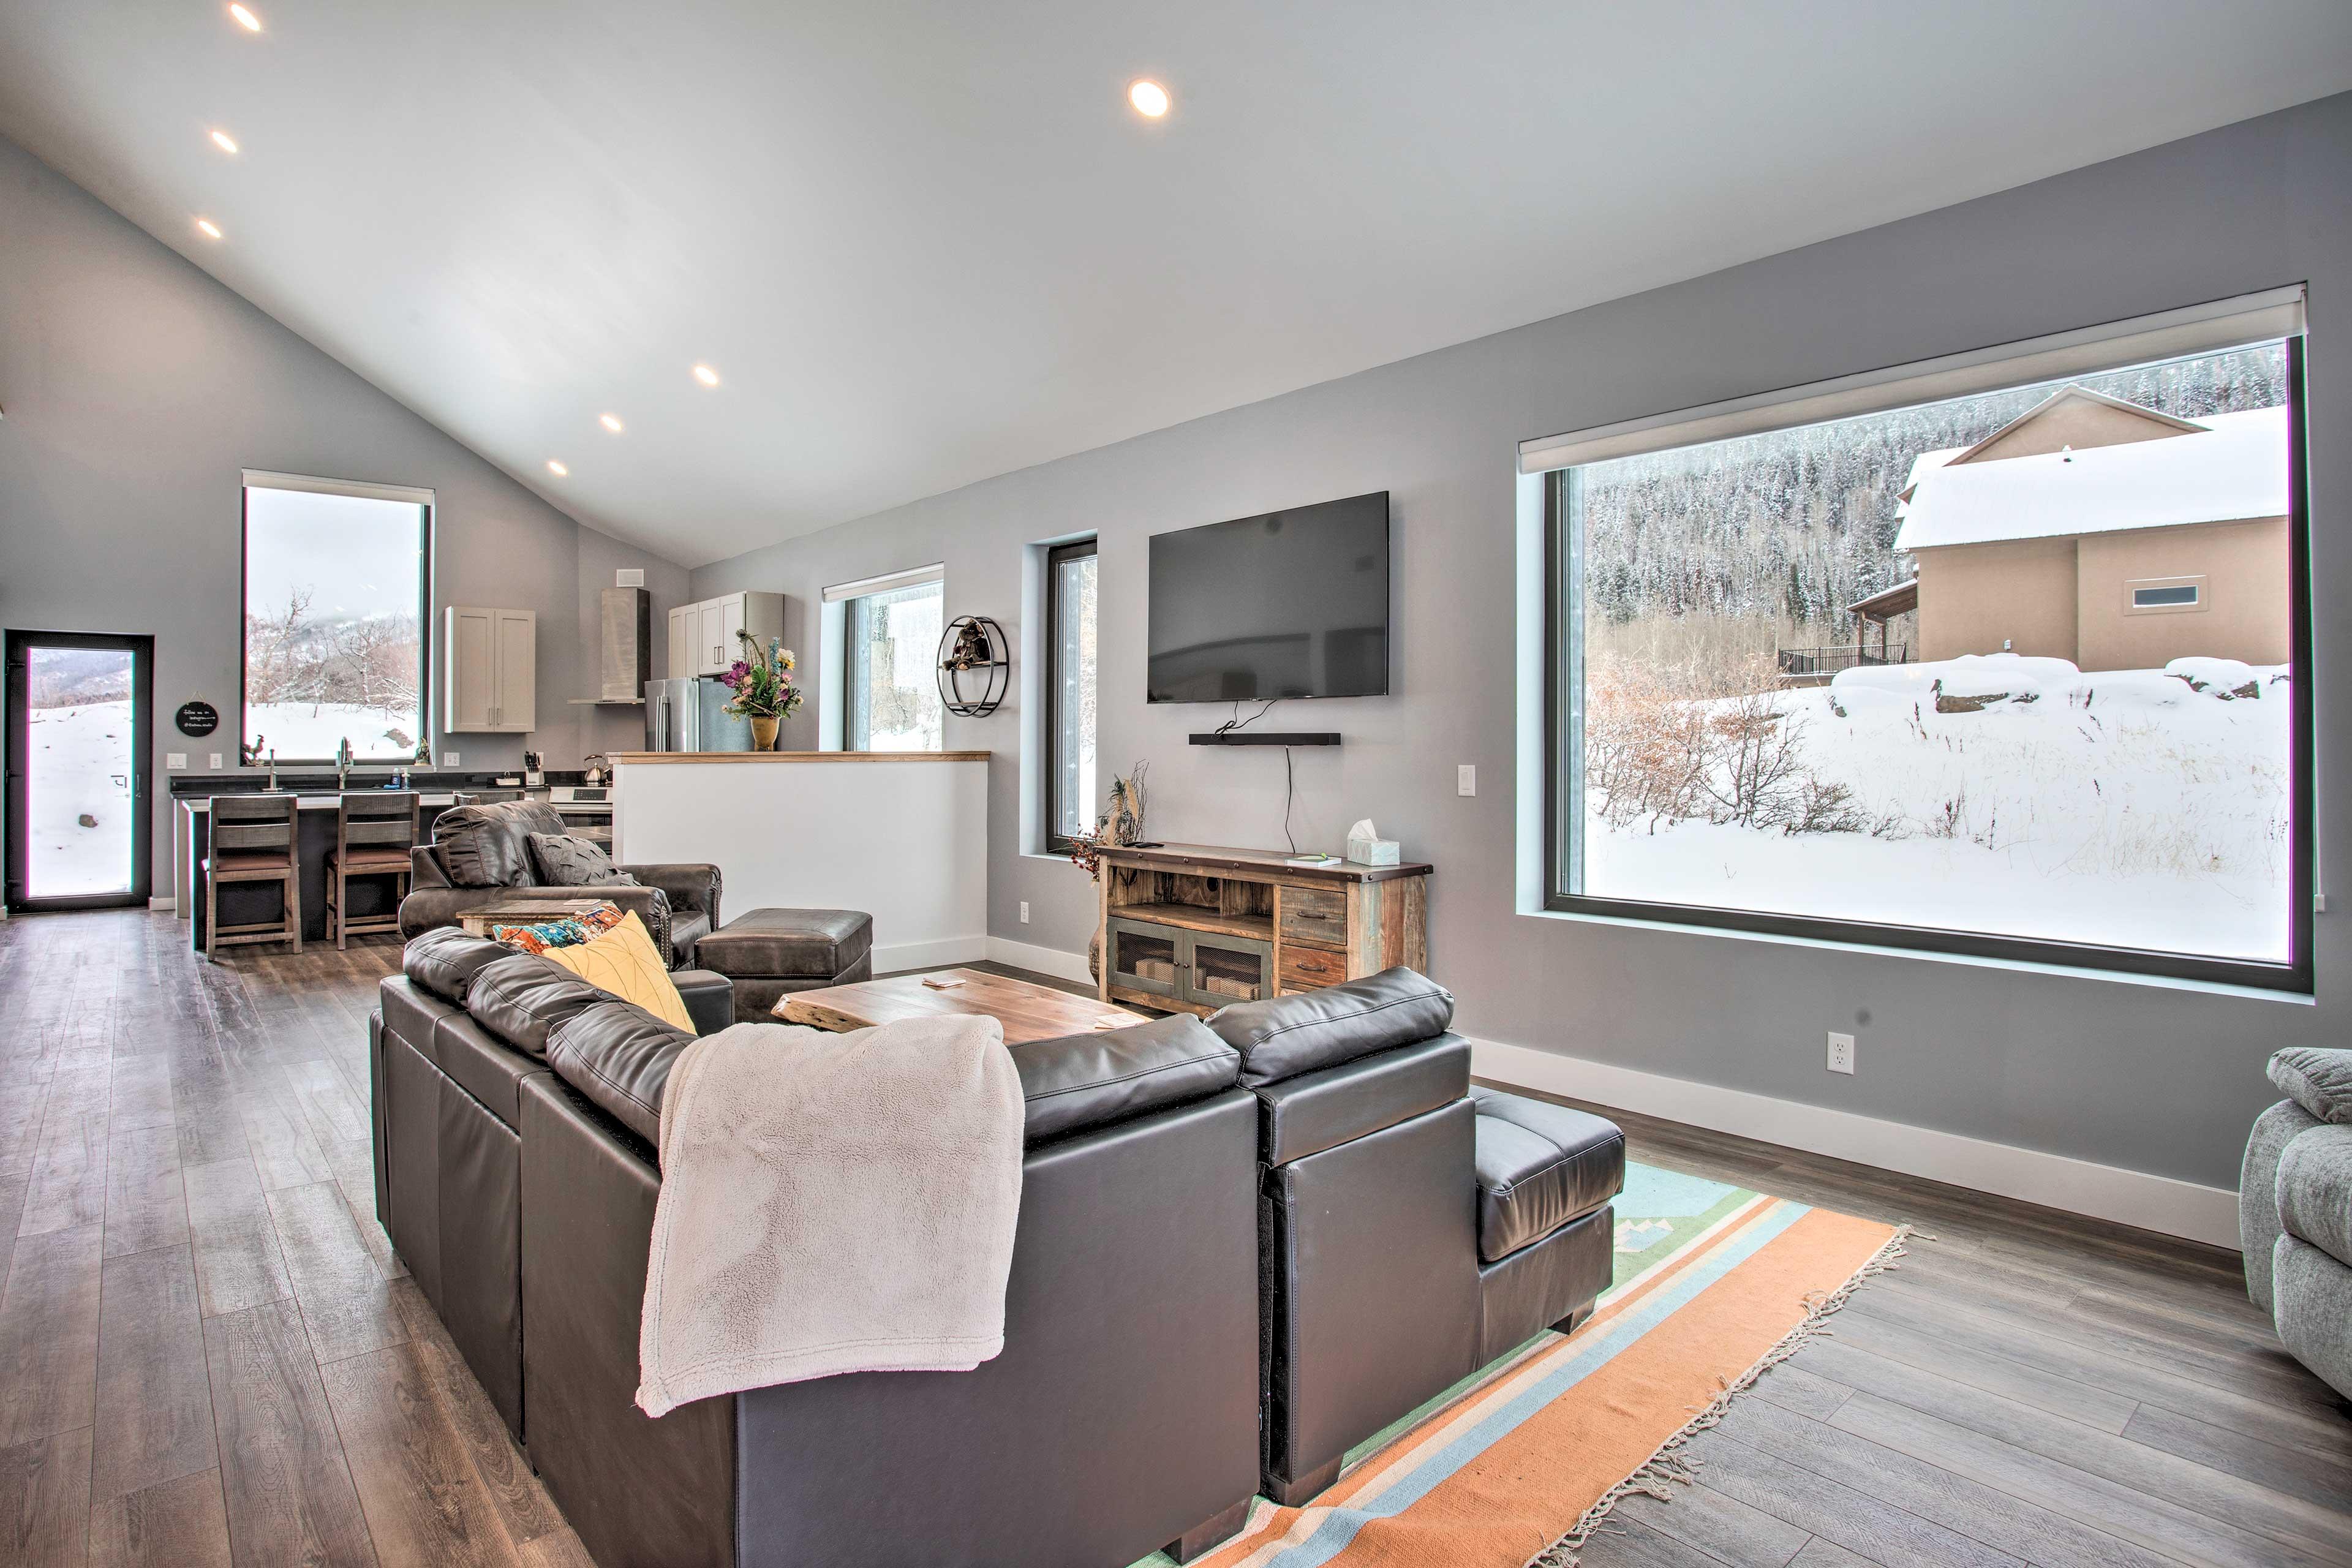 Living Room | Smart TV | Central Heating